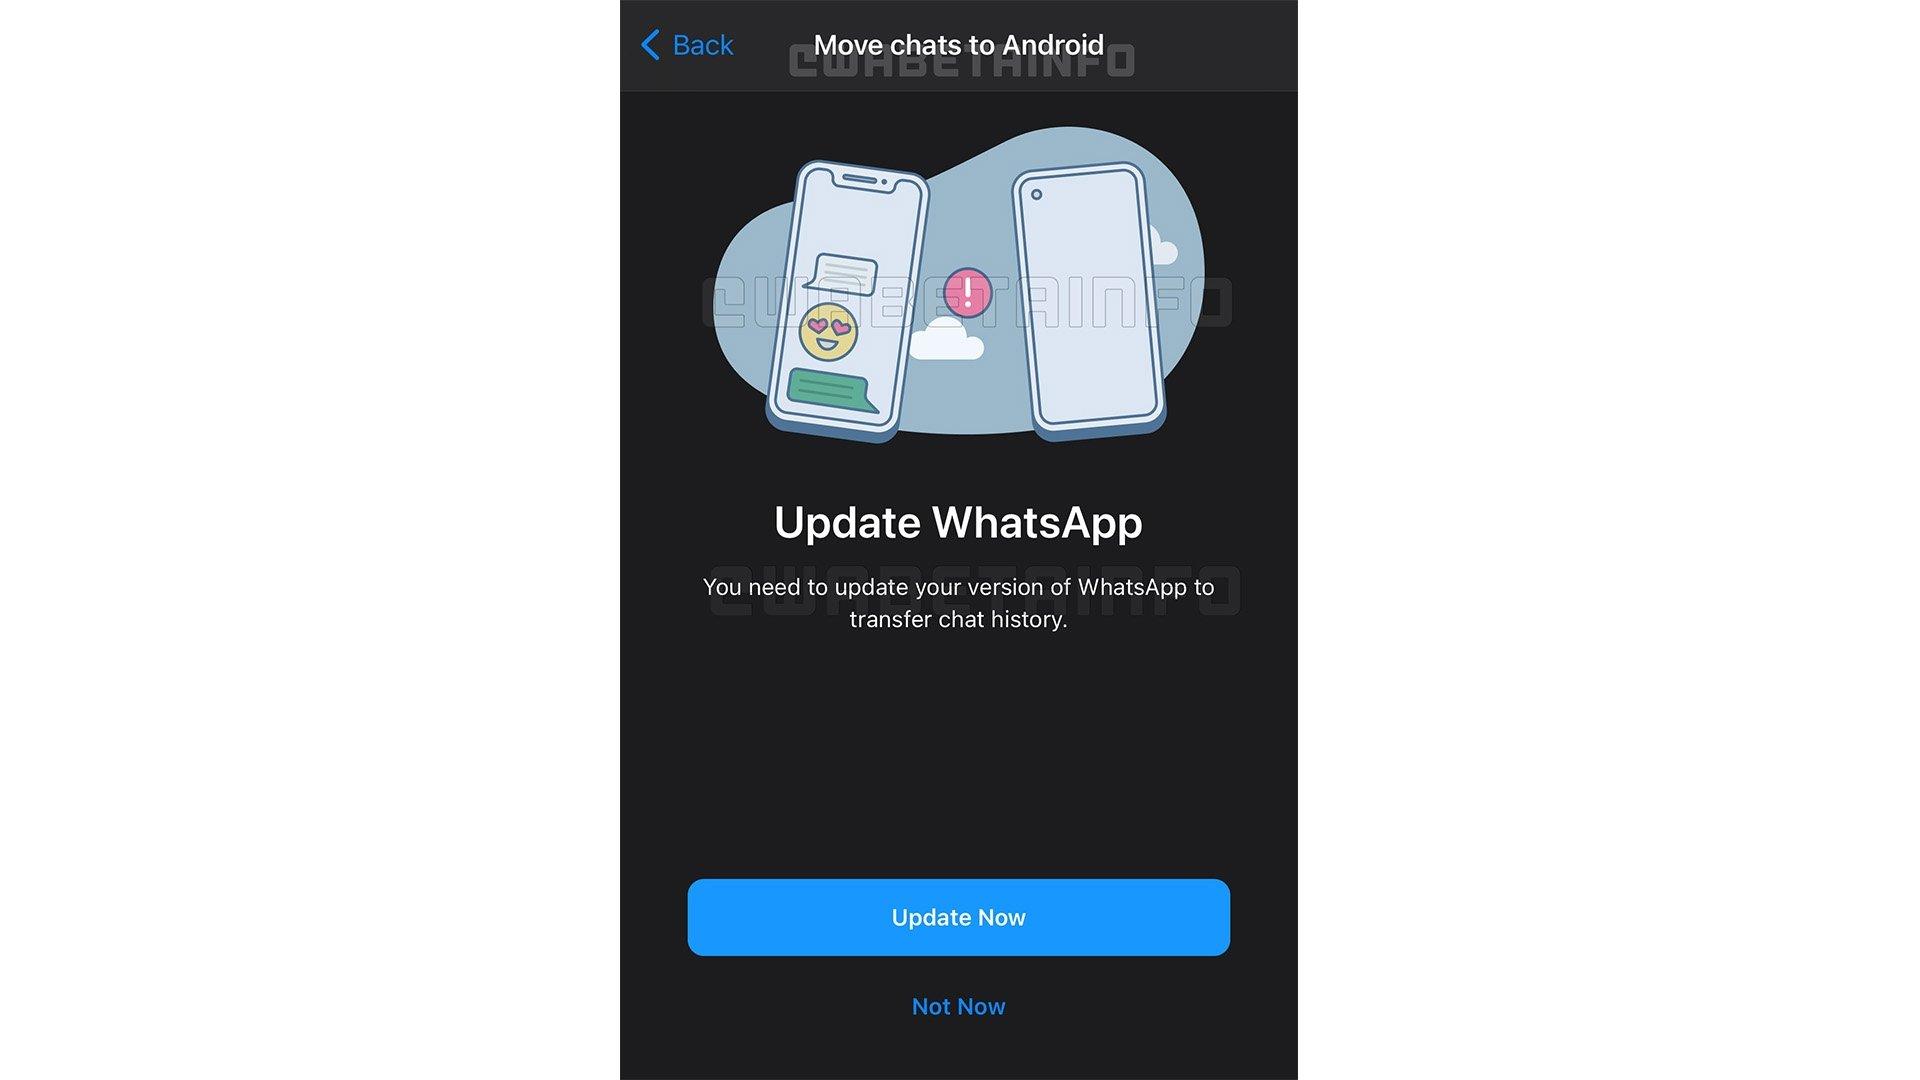 WhatsApp migrar conversas